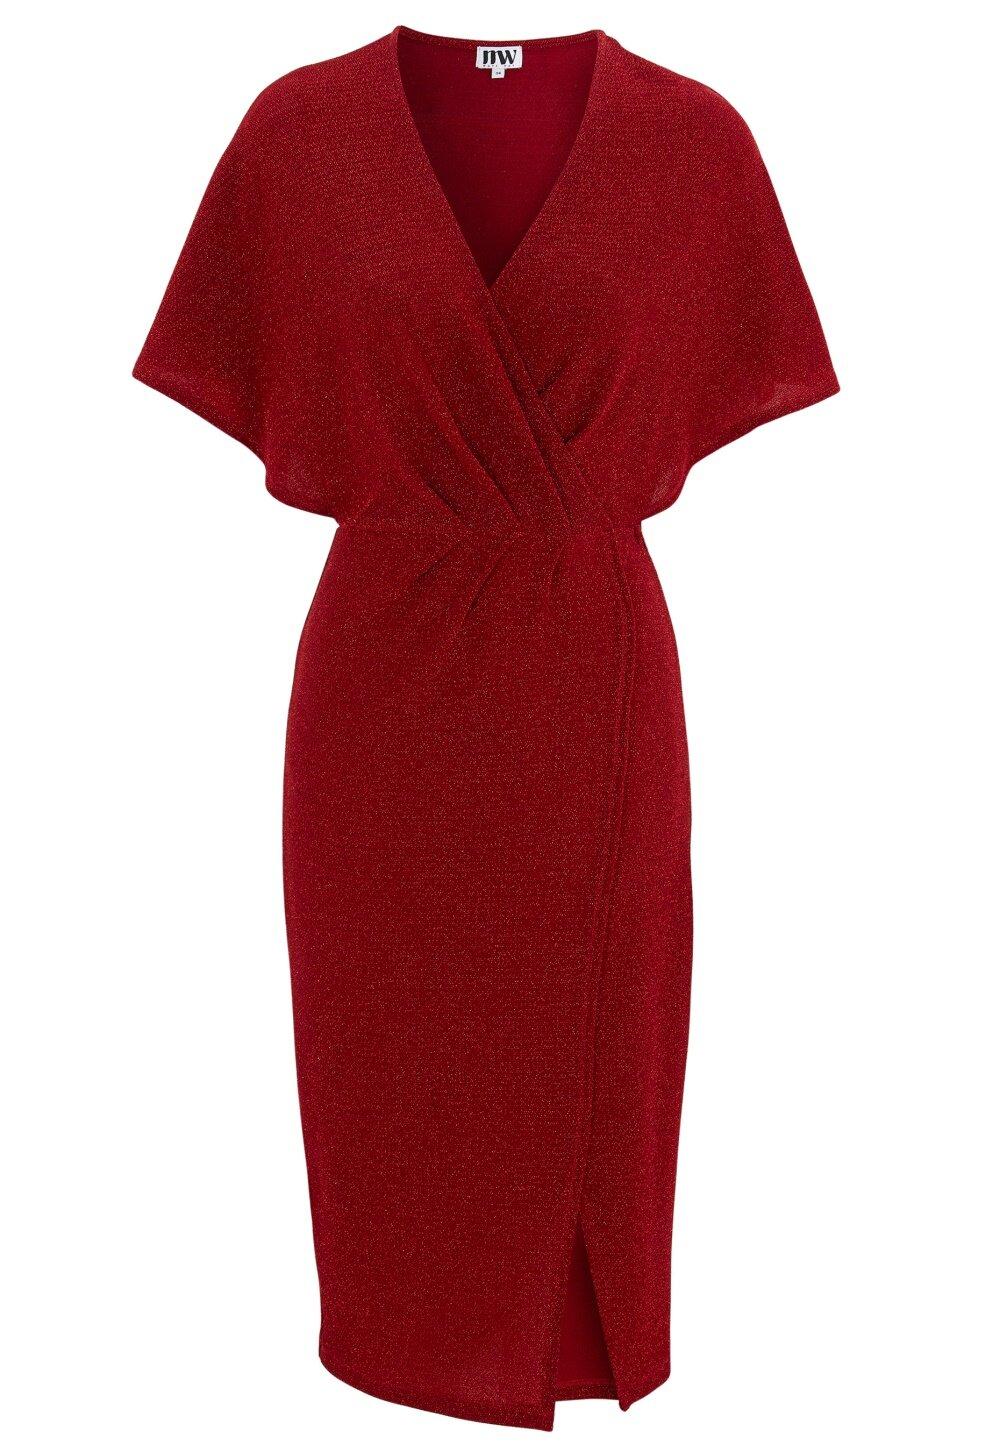 make-way-selena-sparkling-dress-red-red_2